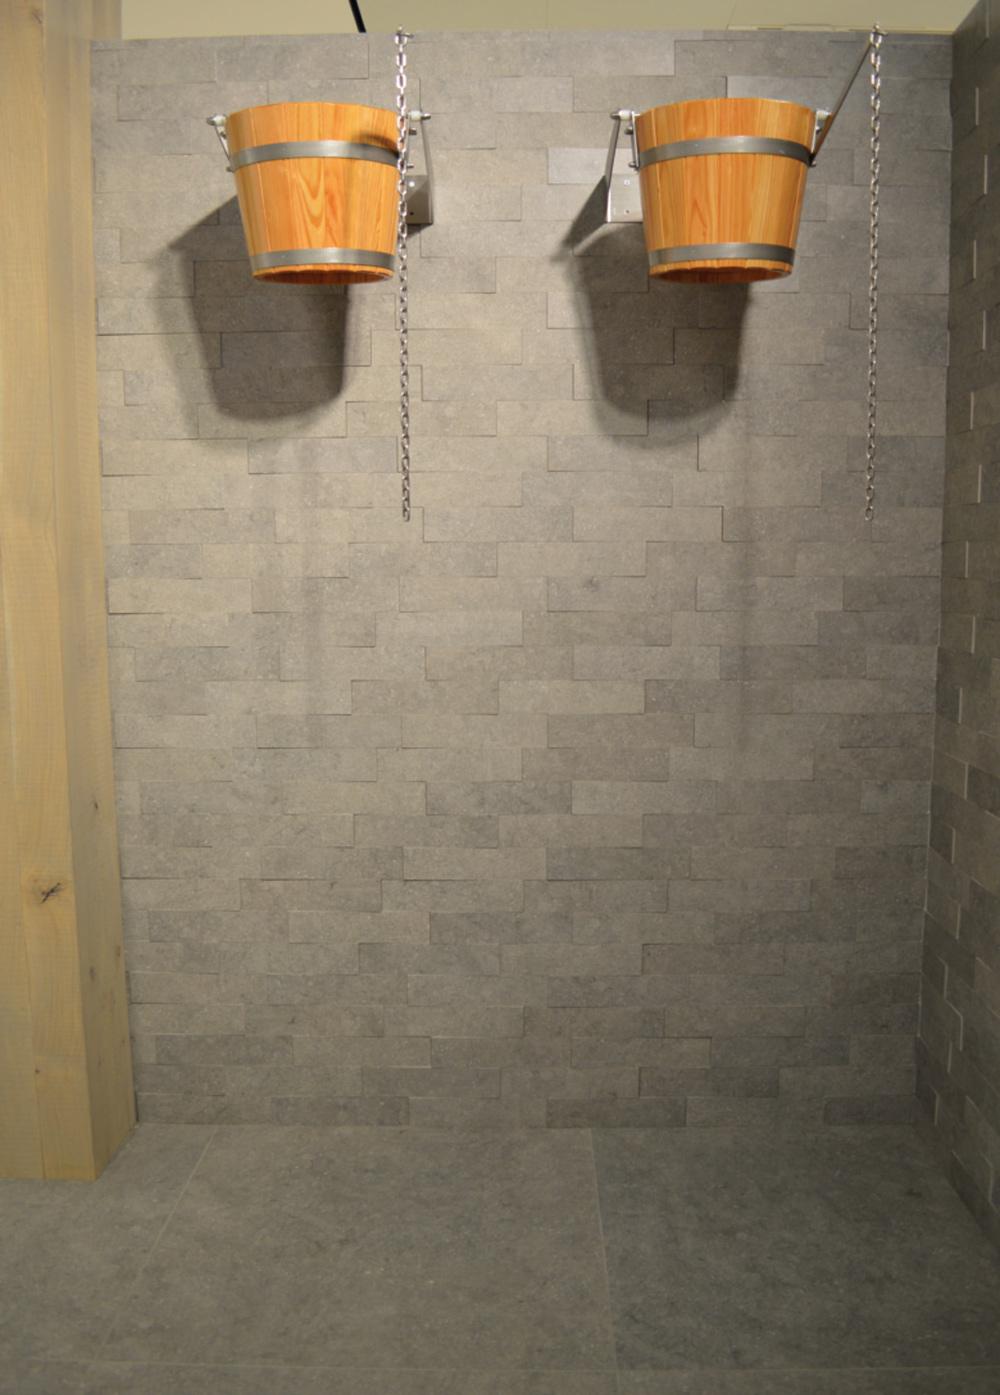 Proizvodnja granitne keramike